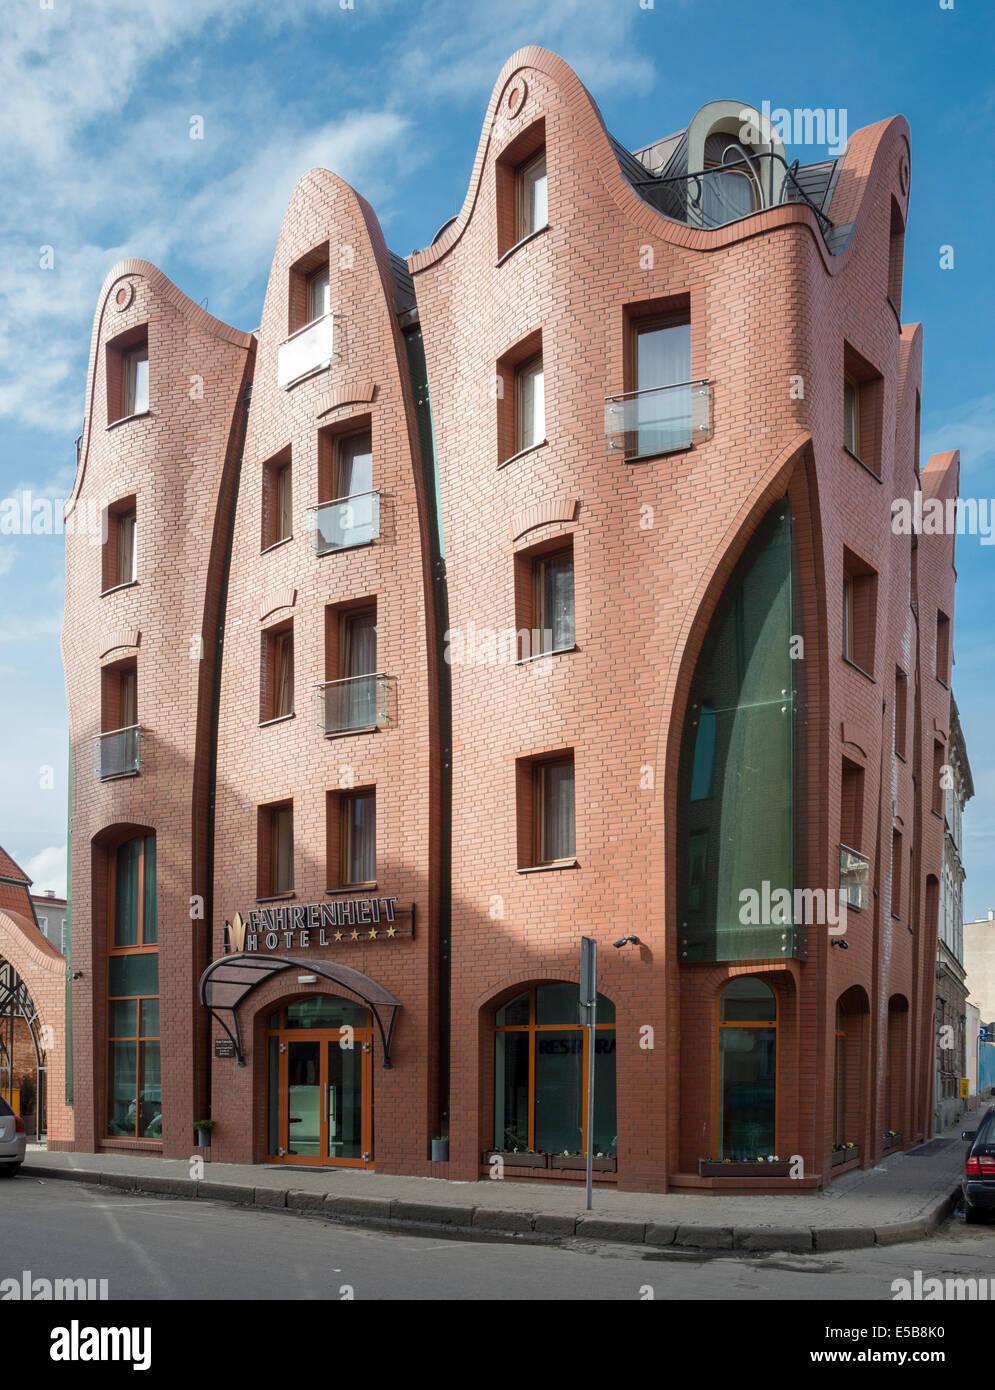 Marvelous Fahrenheit Hotel Unusual Brick Building Design In Gdansk Danzig Largest Home Design Picture Inspirations Pitcheantrous